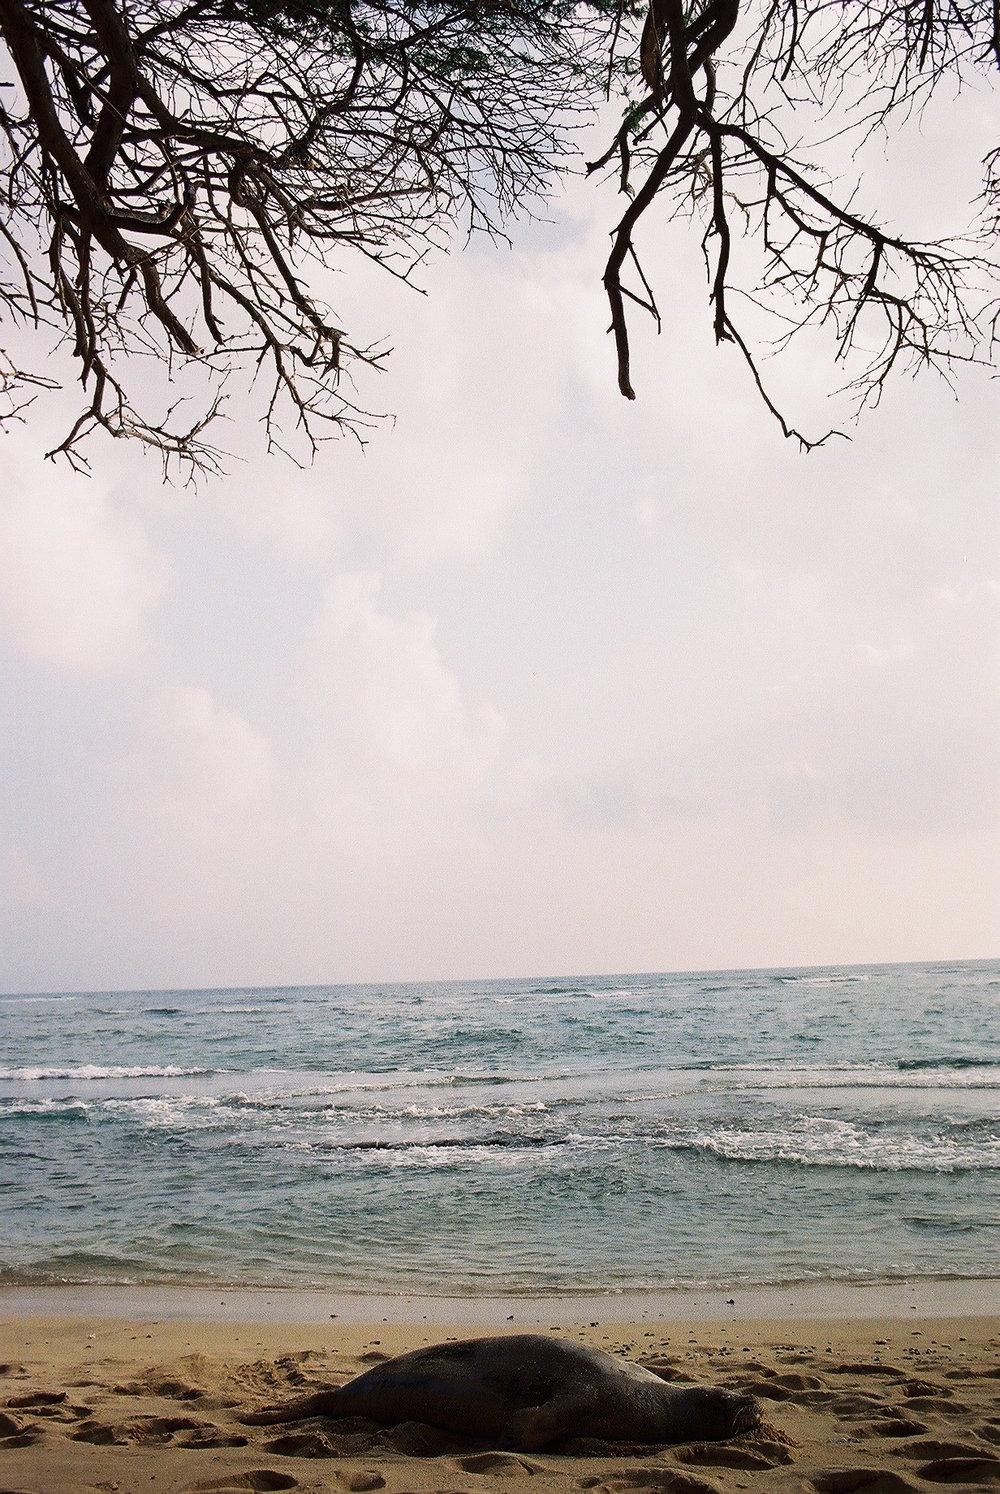 monk seal - Honolulu, HI